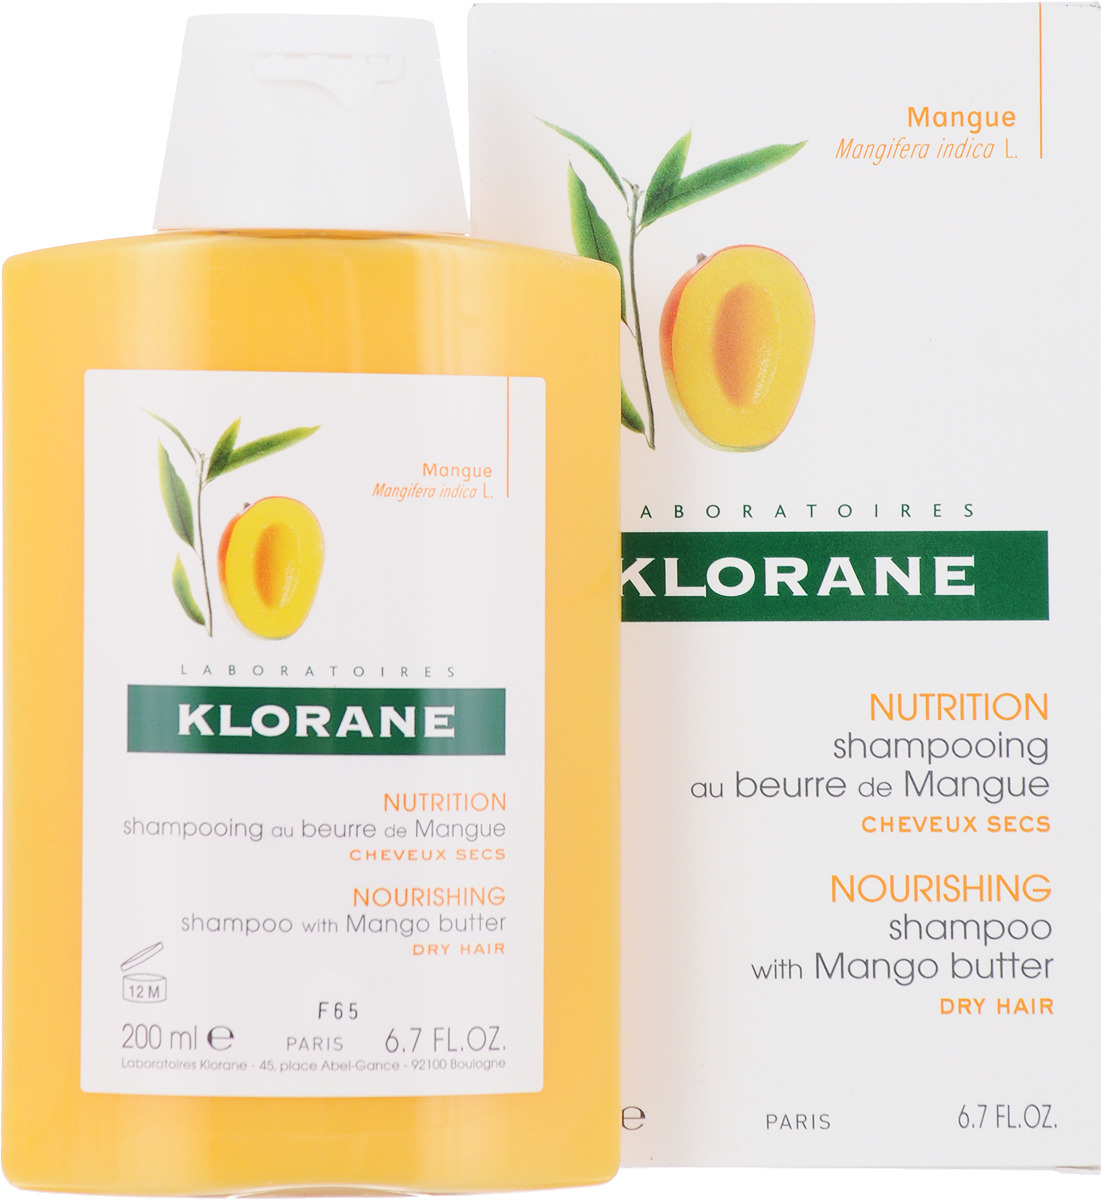 Klorane Dry Hair Шампунь с маслом манго для сухих, поврежденных волос, 200 мл шампунь klorane с маслом манго для сухих и поврежденных волос 200 мл